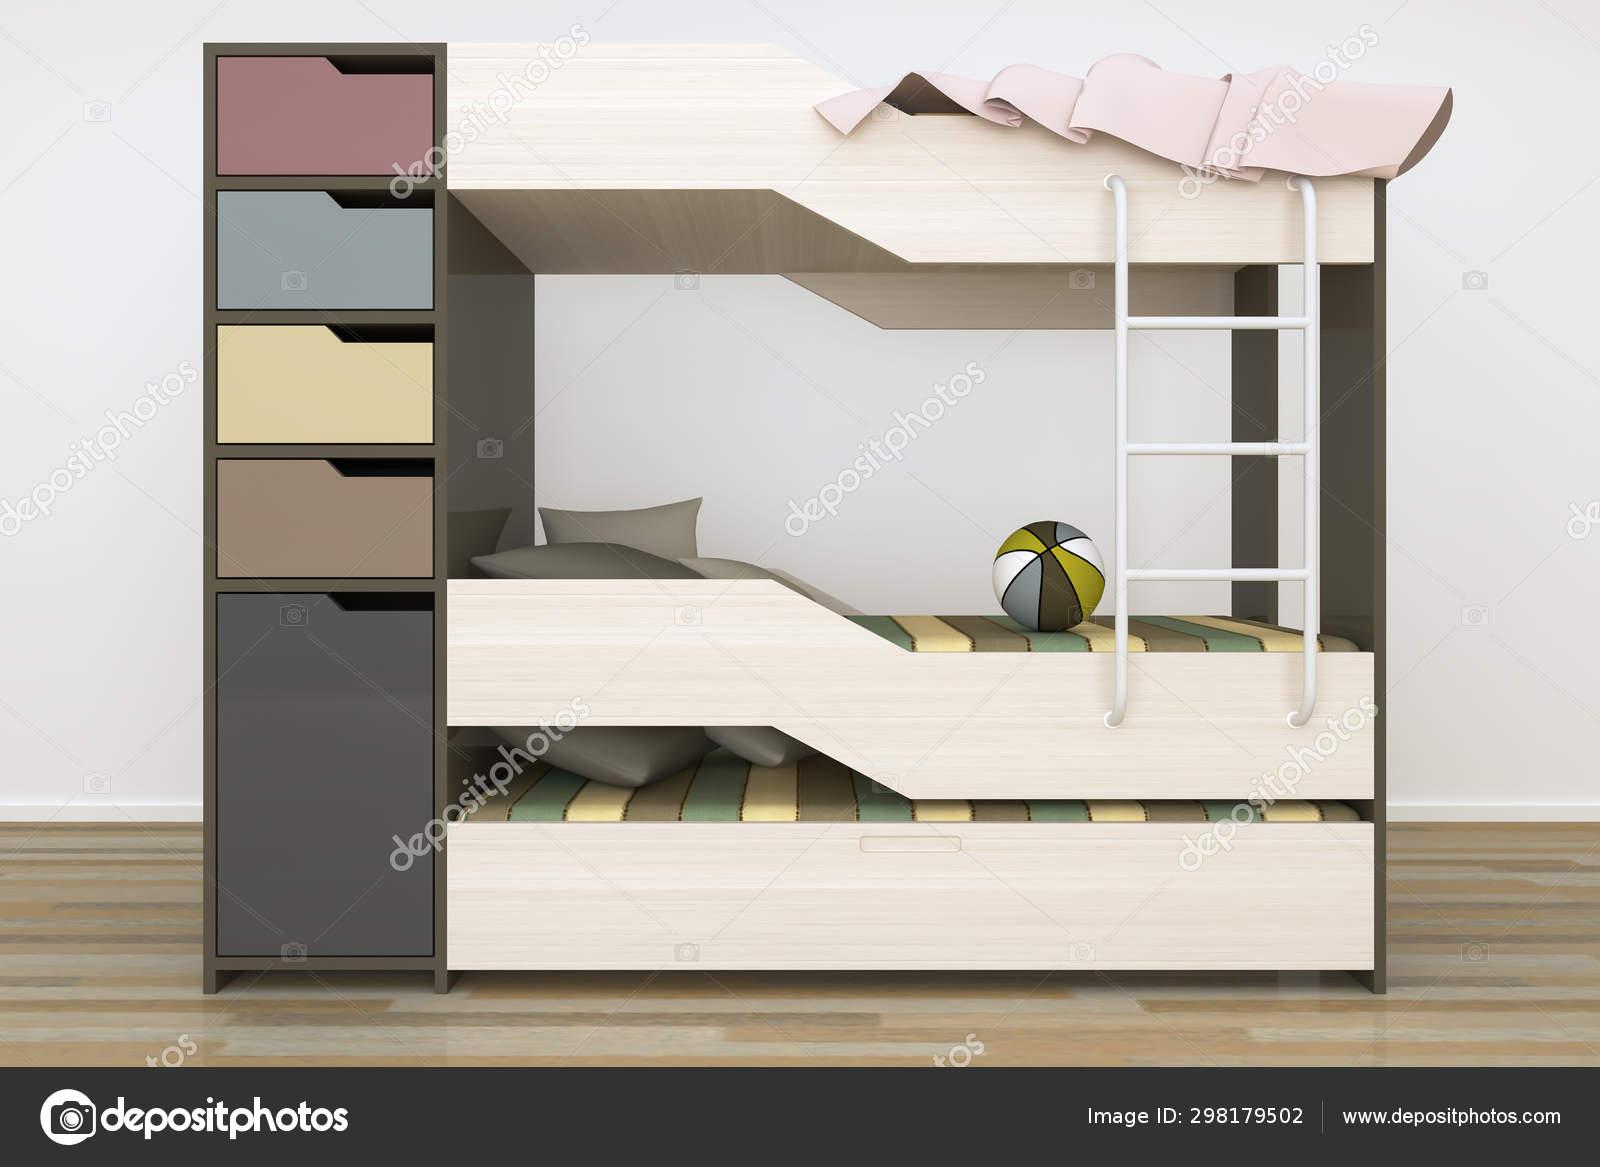 Realistic Rendering Modern Kids Bedroom Furniture Design ...